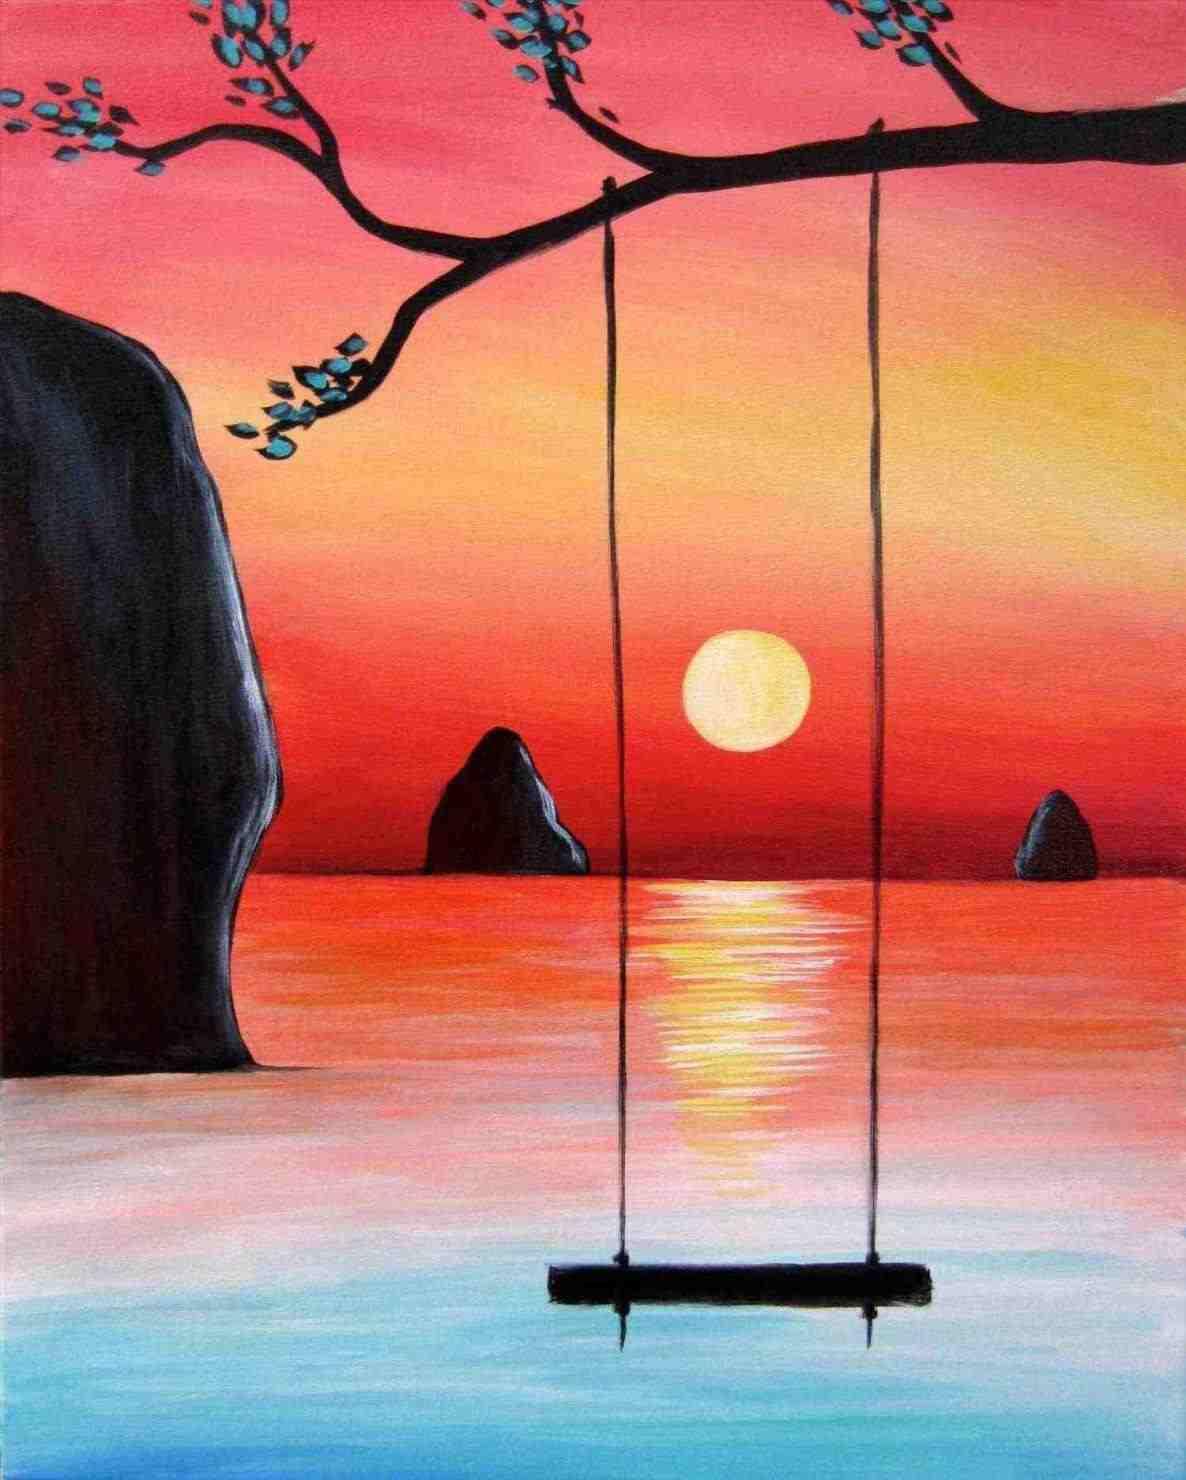 Easy Watercolor Paintings at GetDrawings | Free download